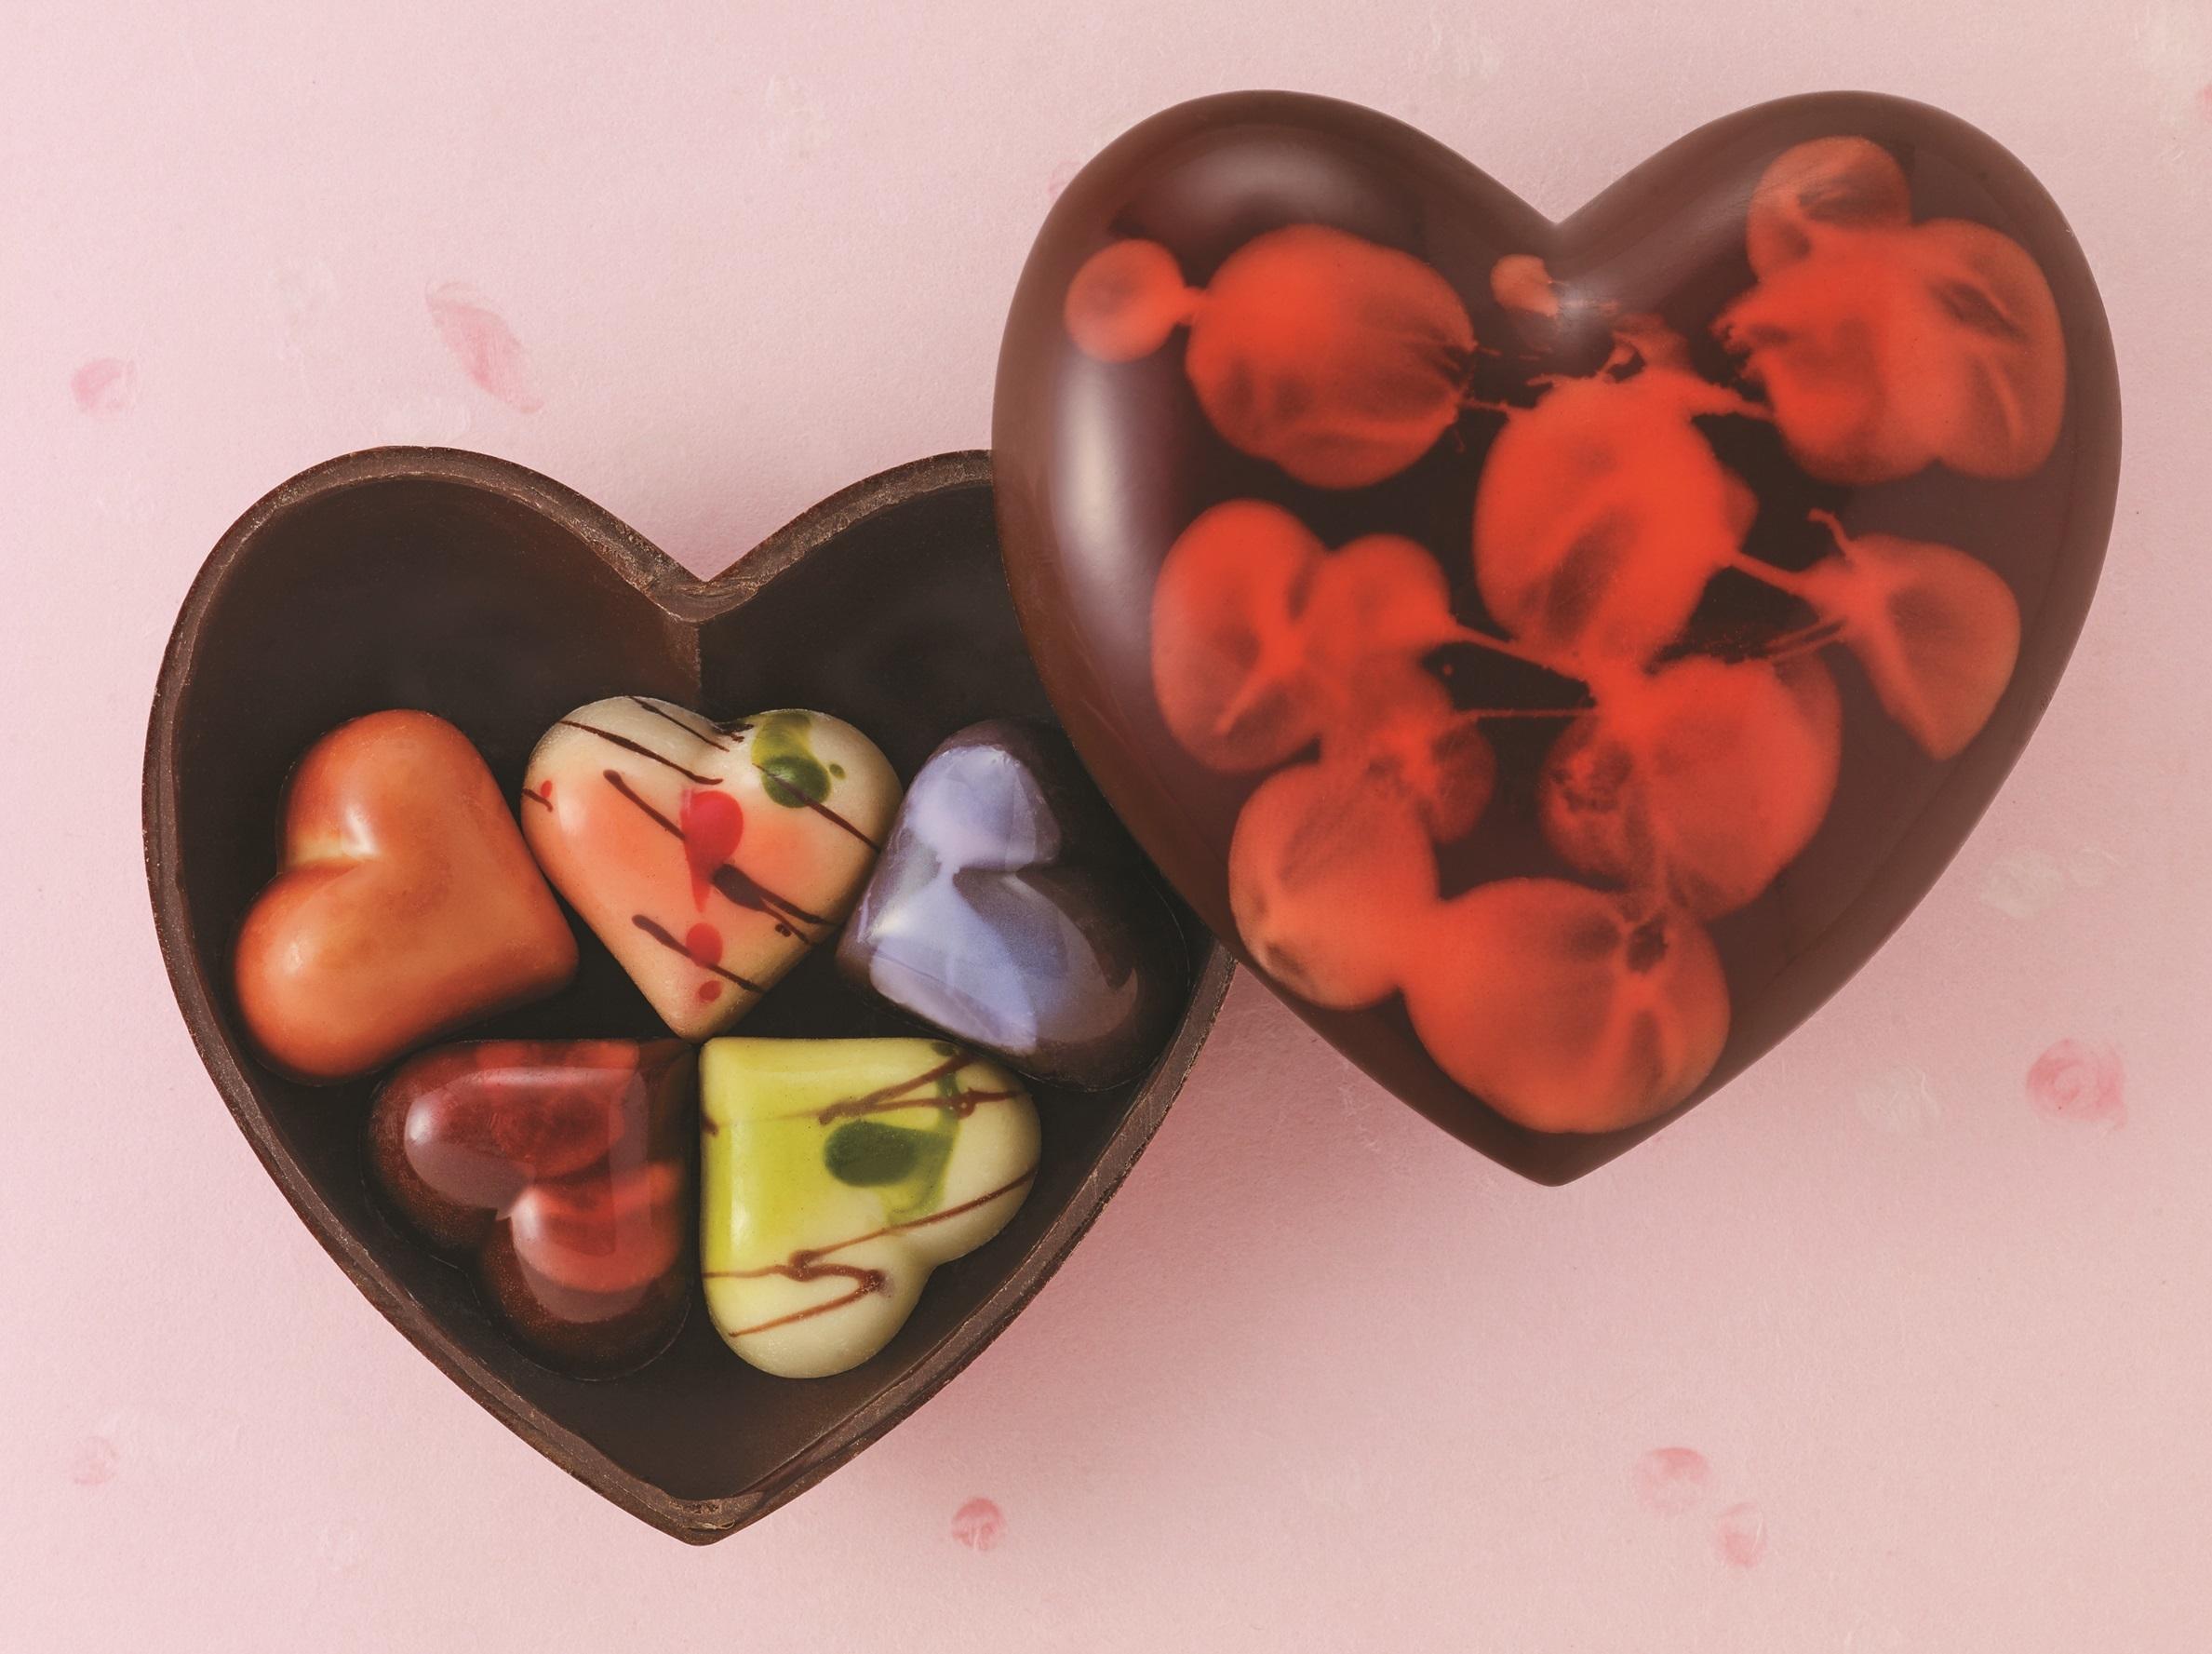 Okada Museum Chocolate『プレシャスハート』 4,801 円(税込) 日本橋三越本店 限定